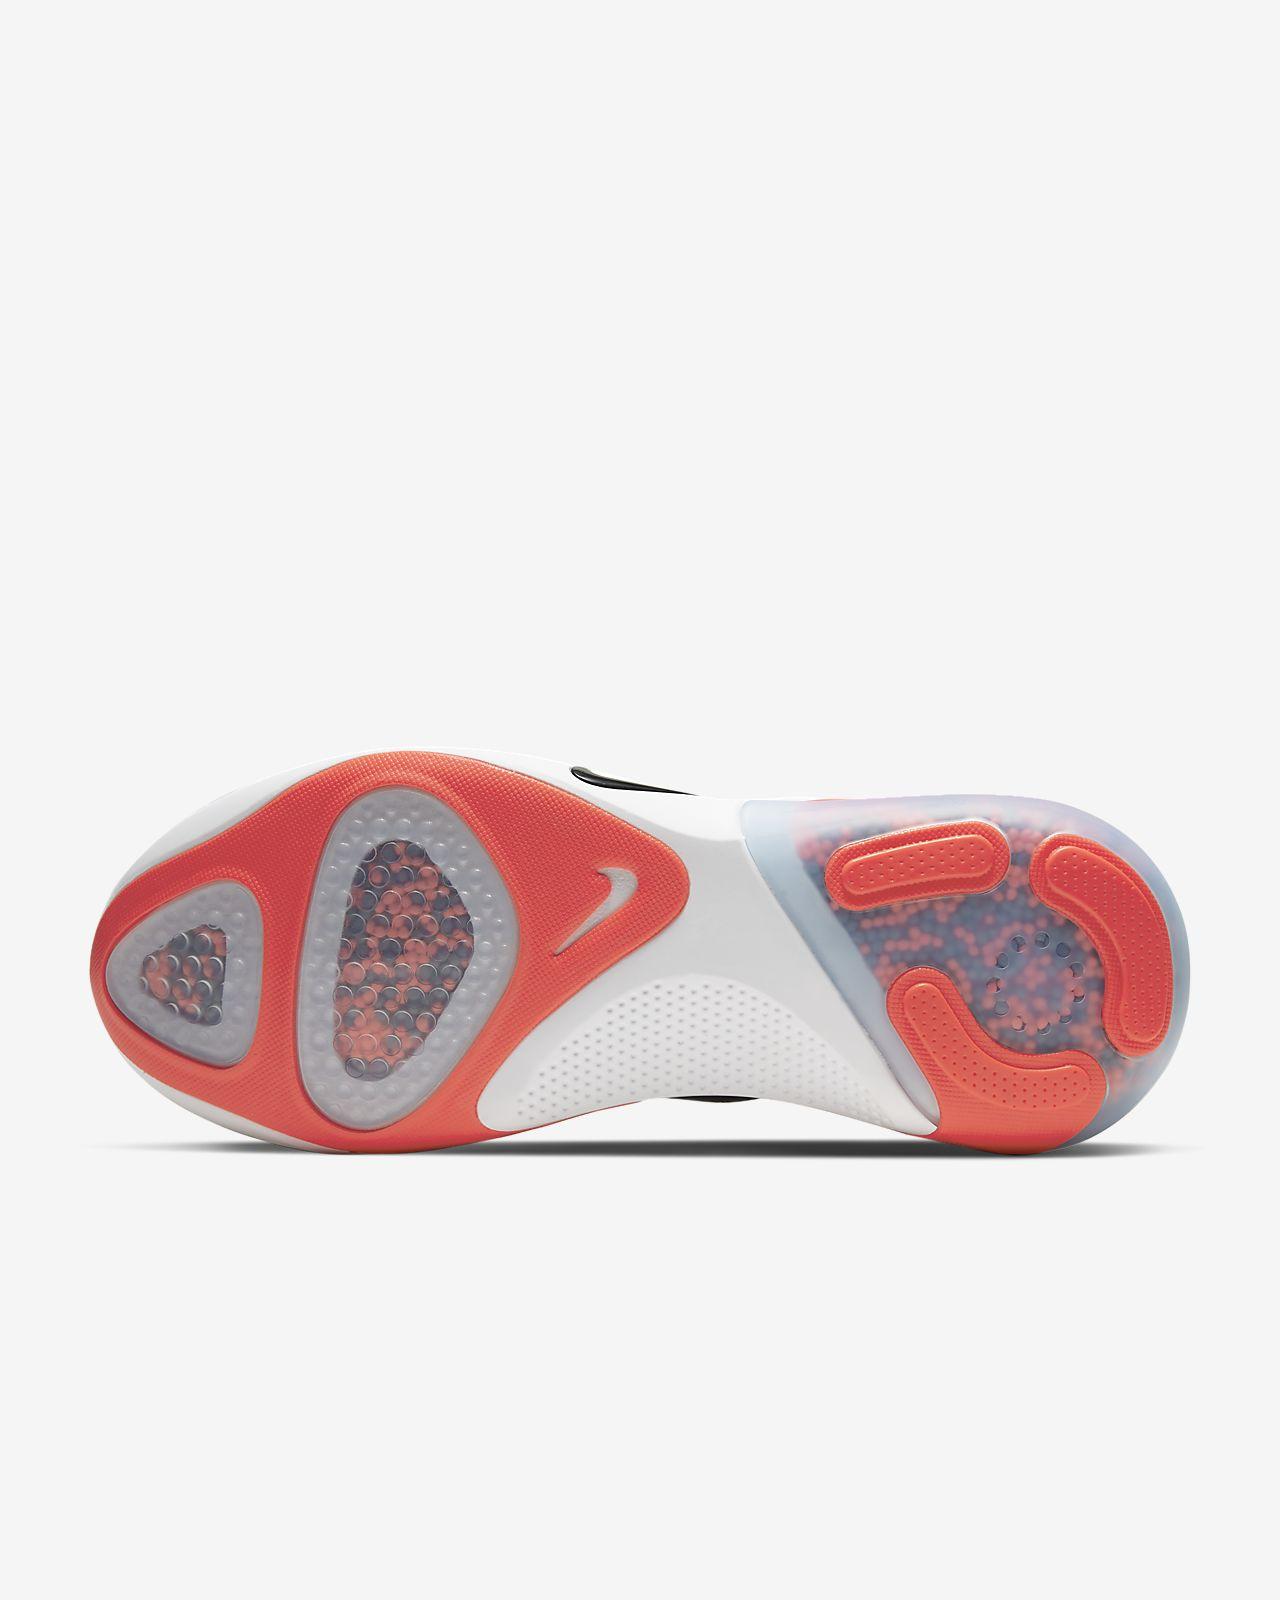 Nike FUTURE FAST RACER Black Grey Orange Free delivery